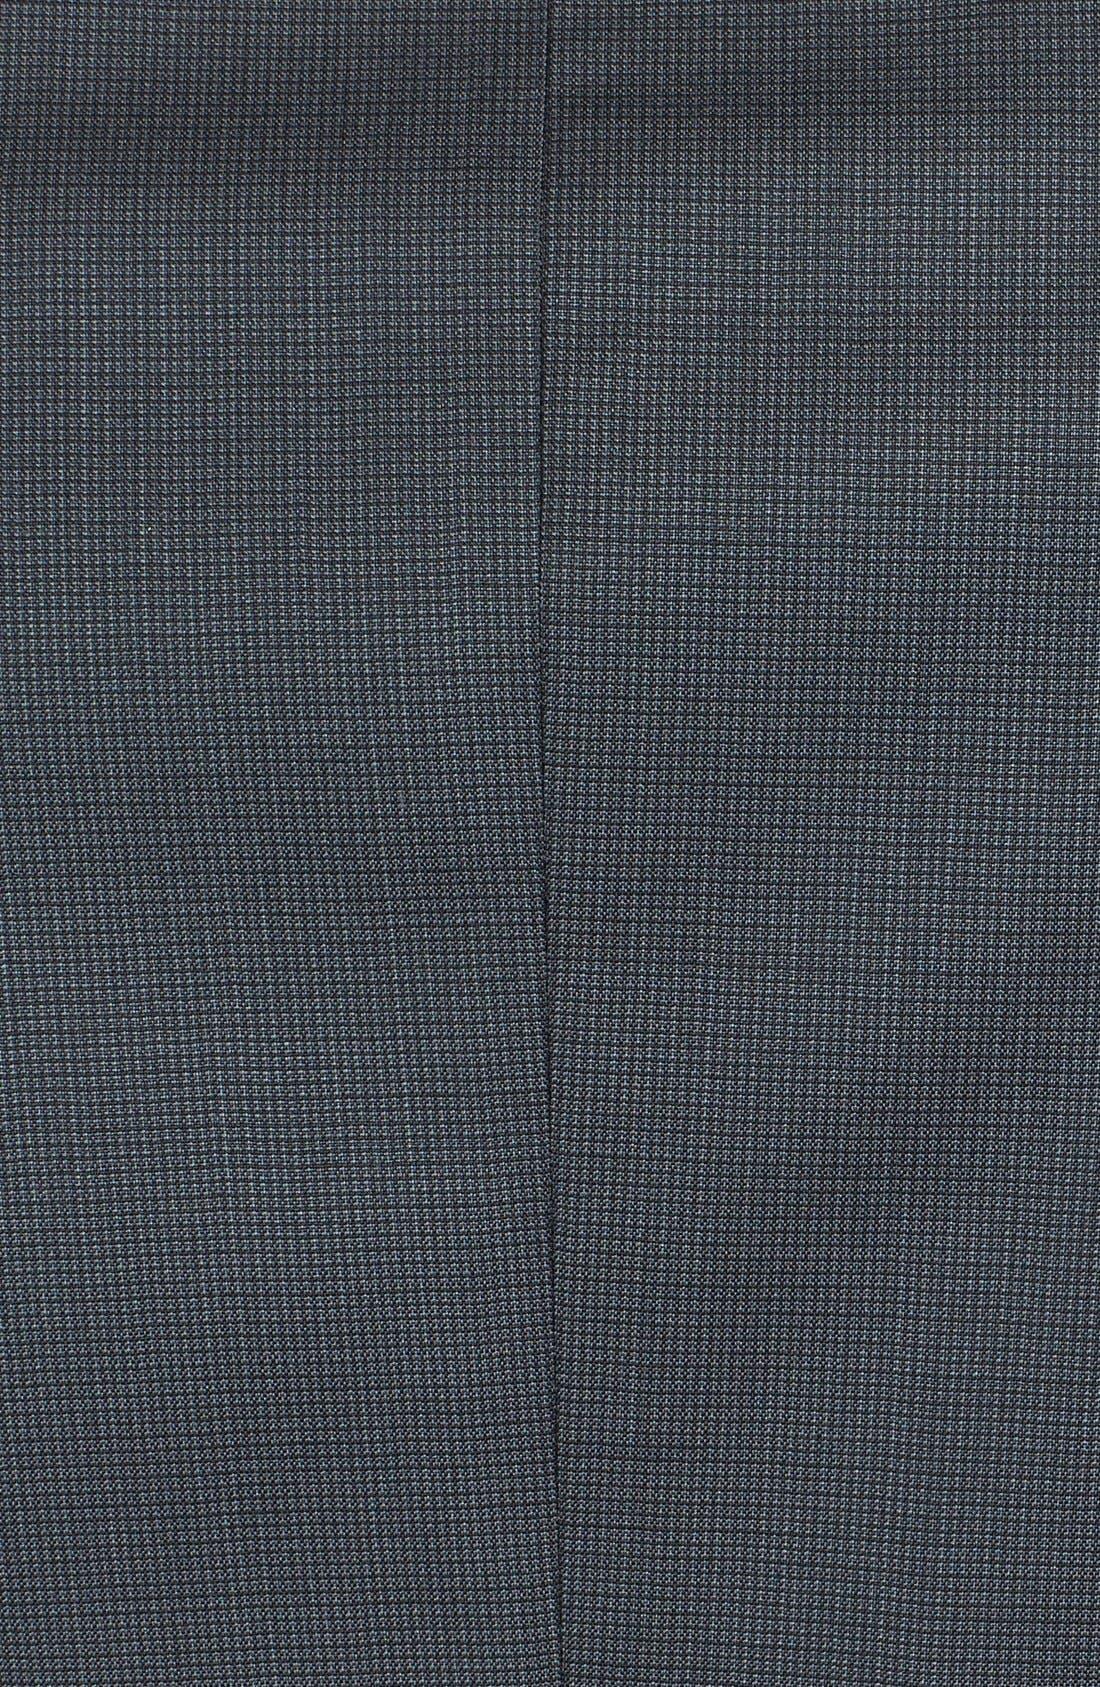 Alternate Image 5  - BOSS HUGO BOSS 'Keys/Shaft' Trim Fit Wool Suit